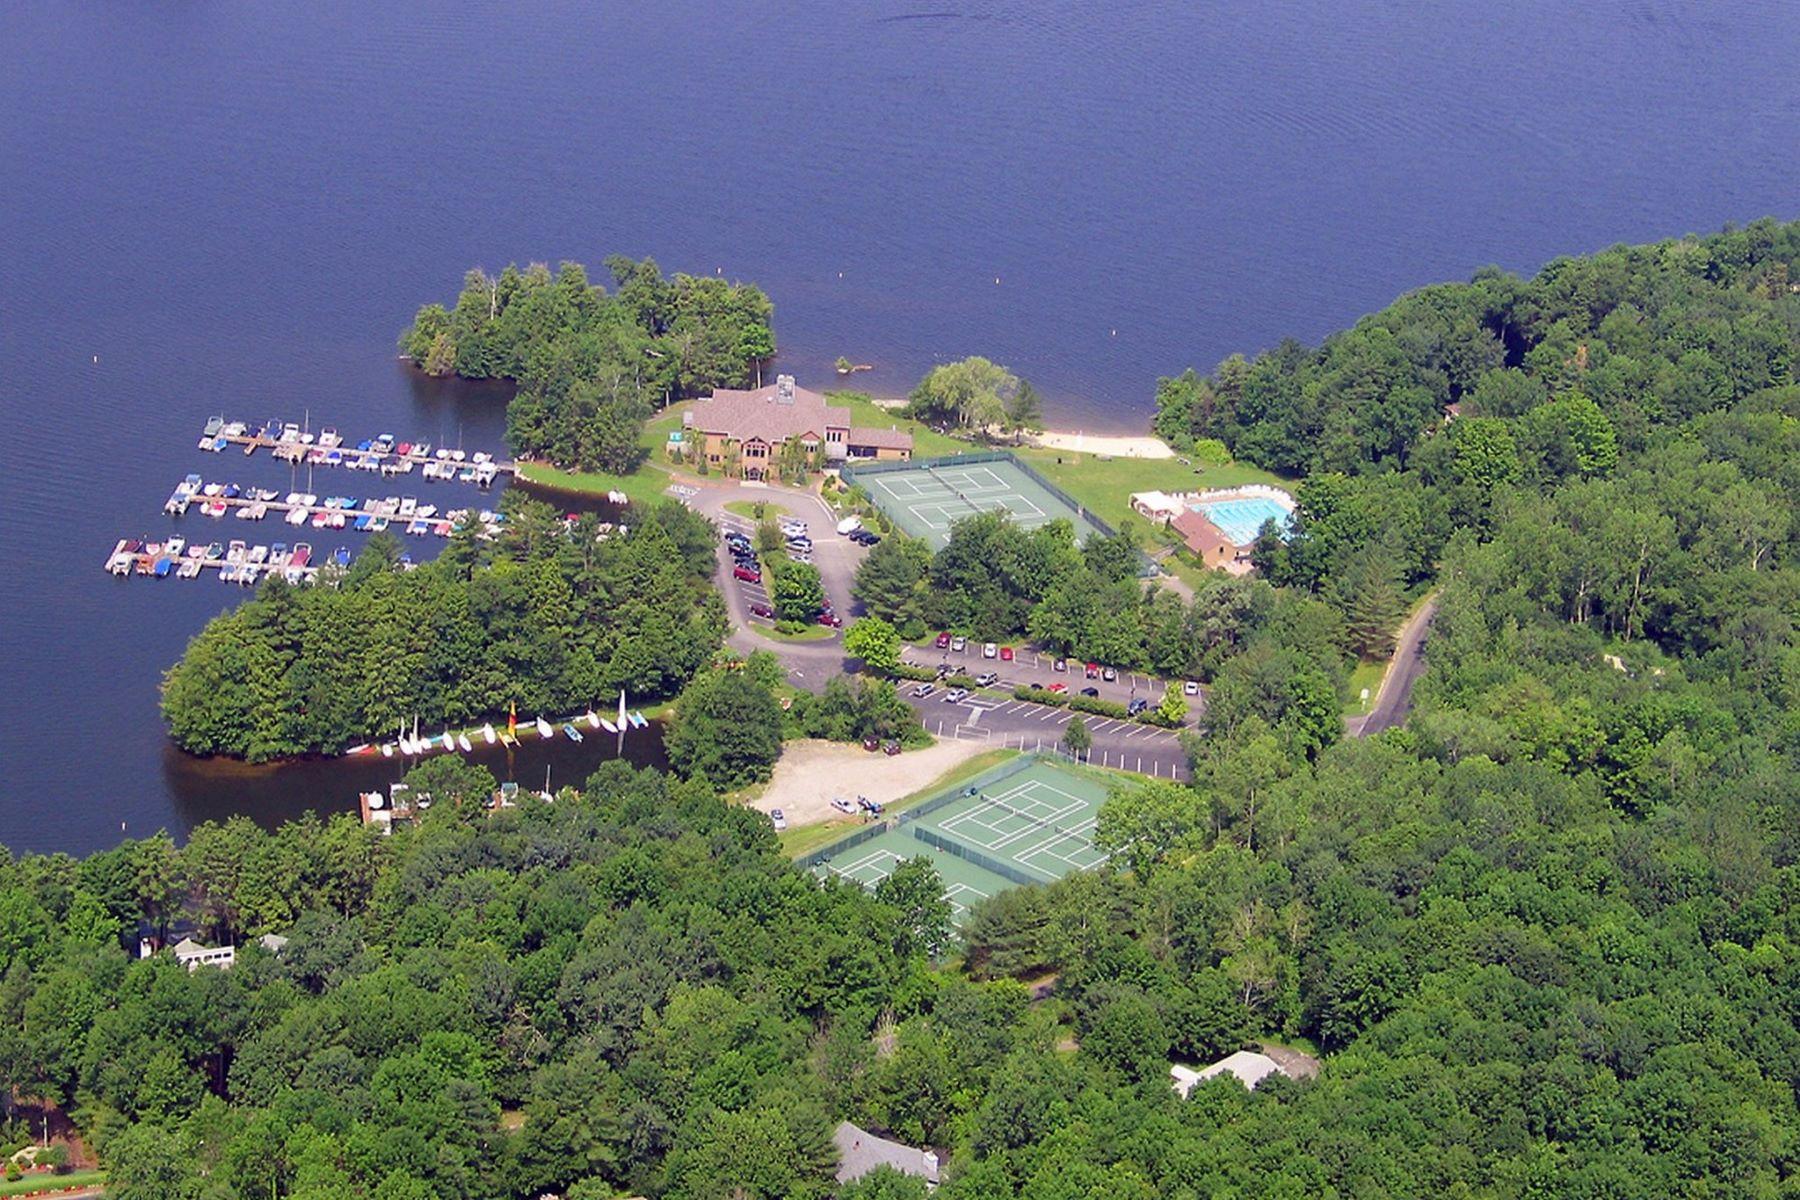 Land for Sale at Woodridge Lake Lot 750 Cornwall Drive, Goshen, Connecticut, 06756 United States